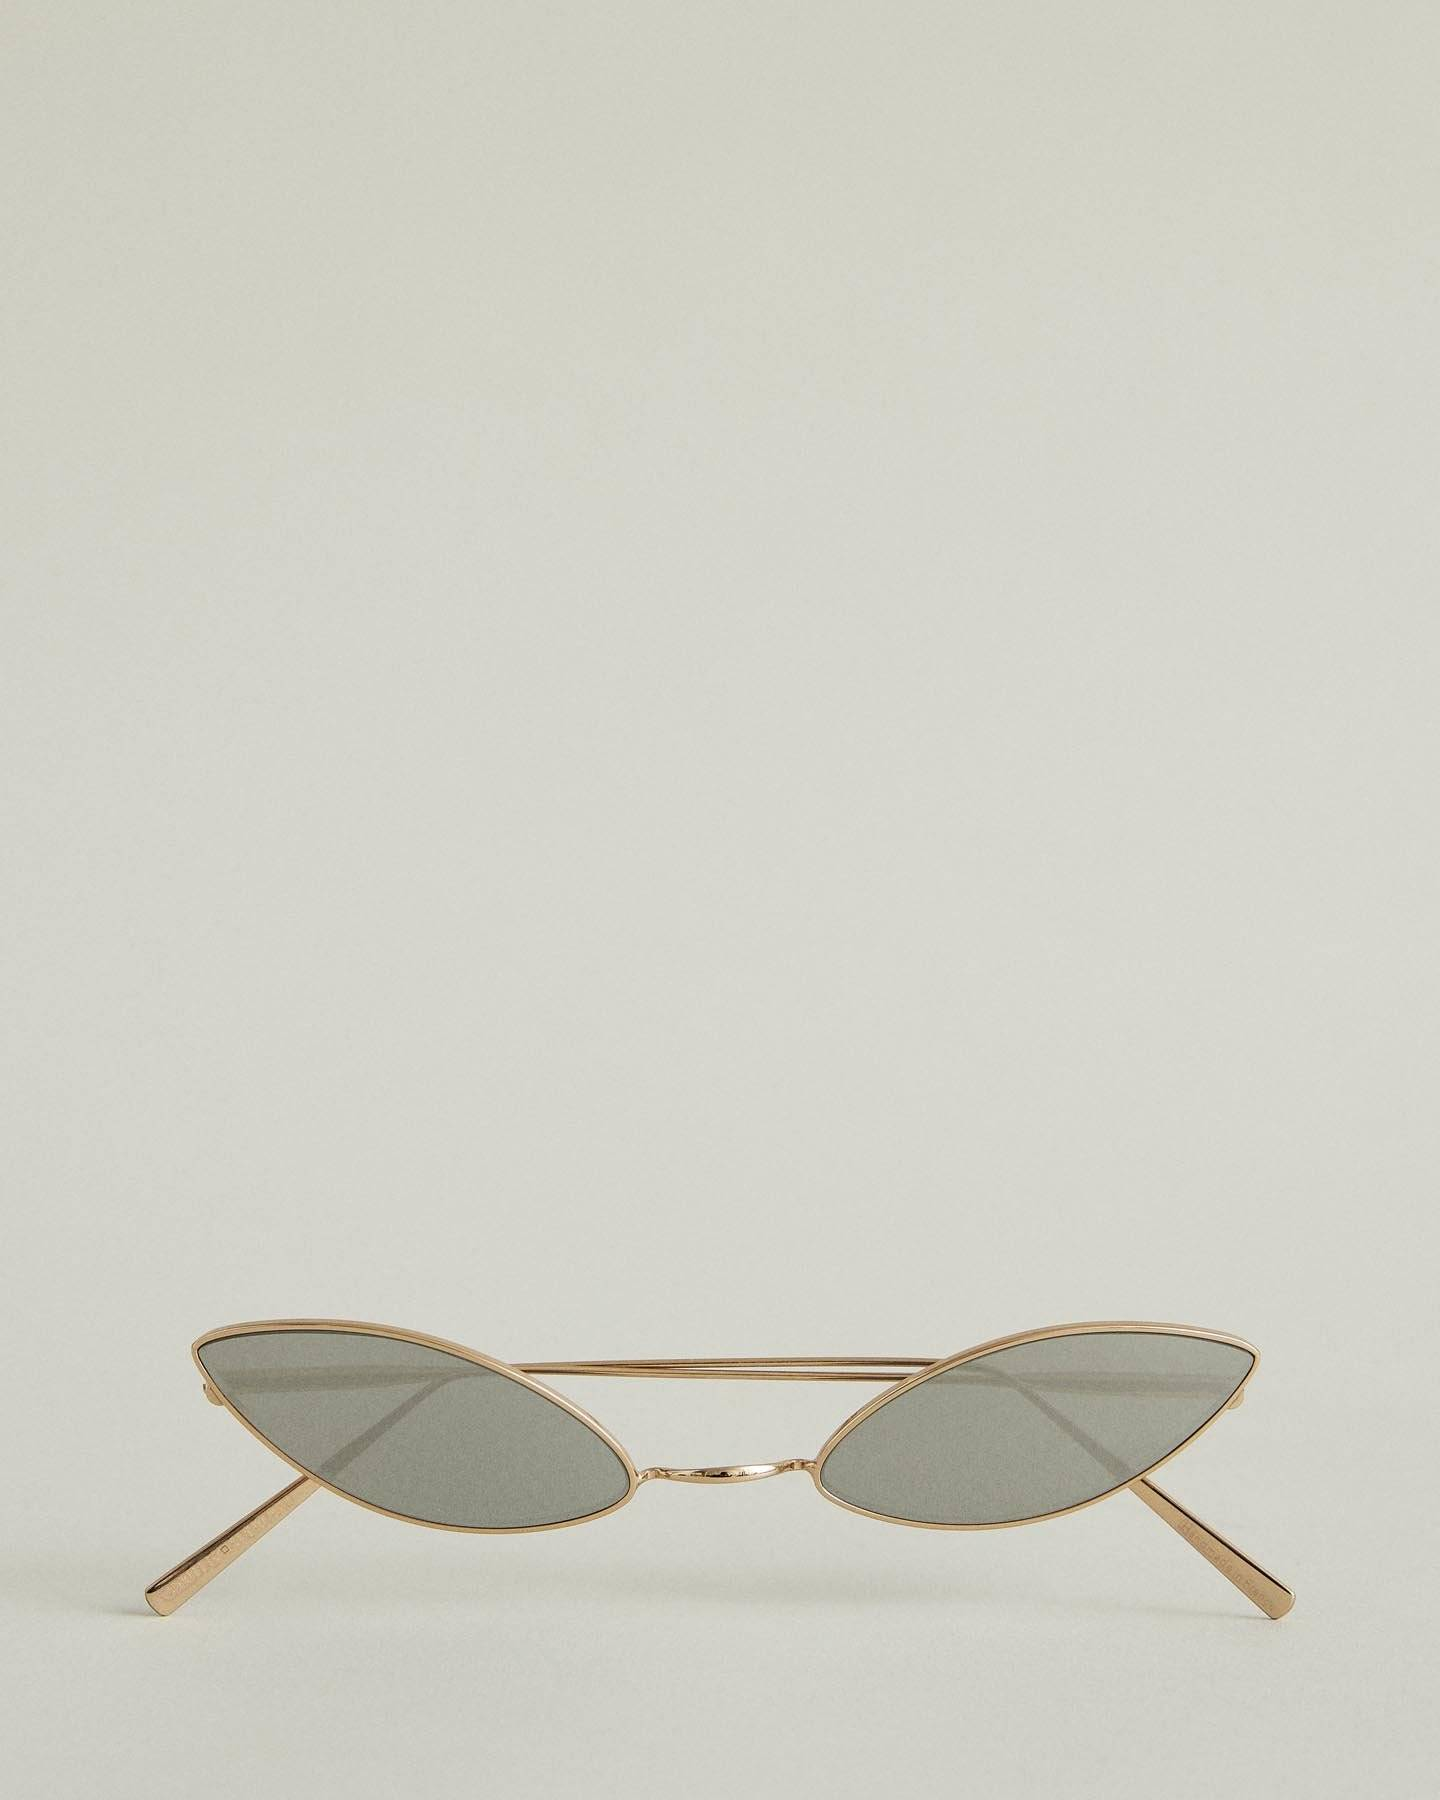 /products/astaria-cat-eye-sunglasses